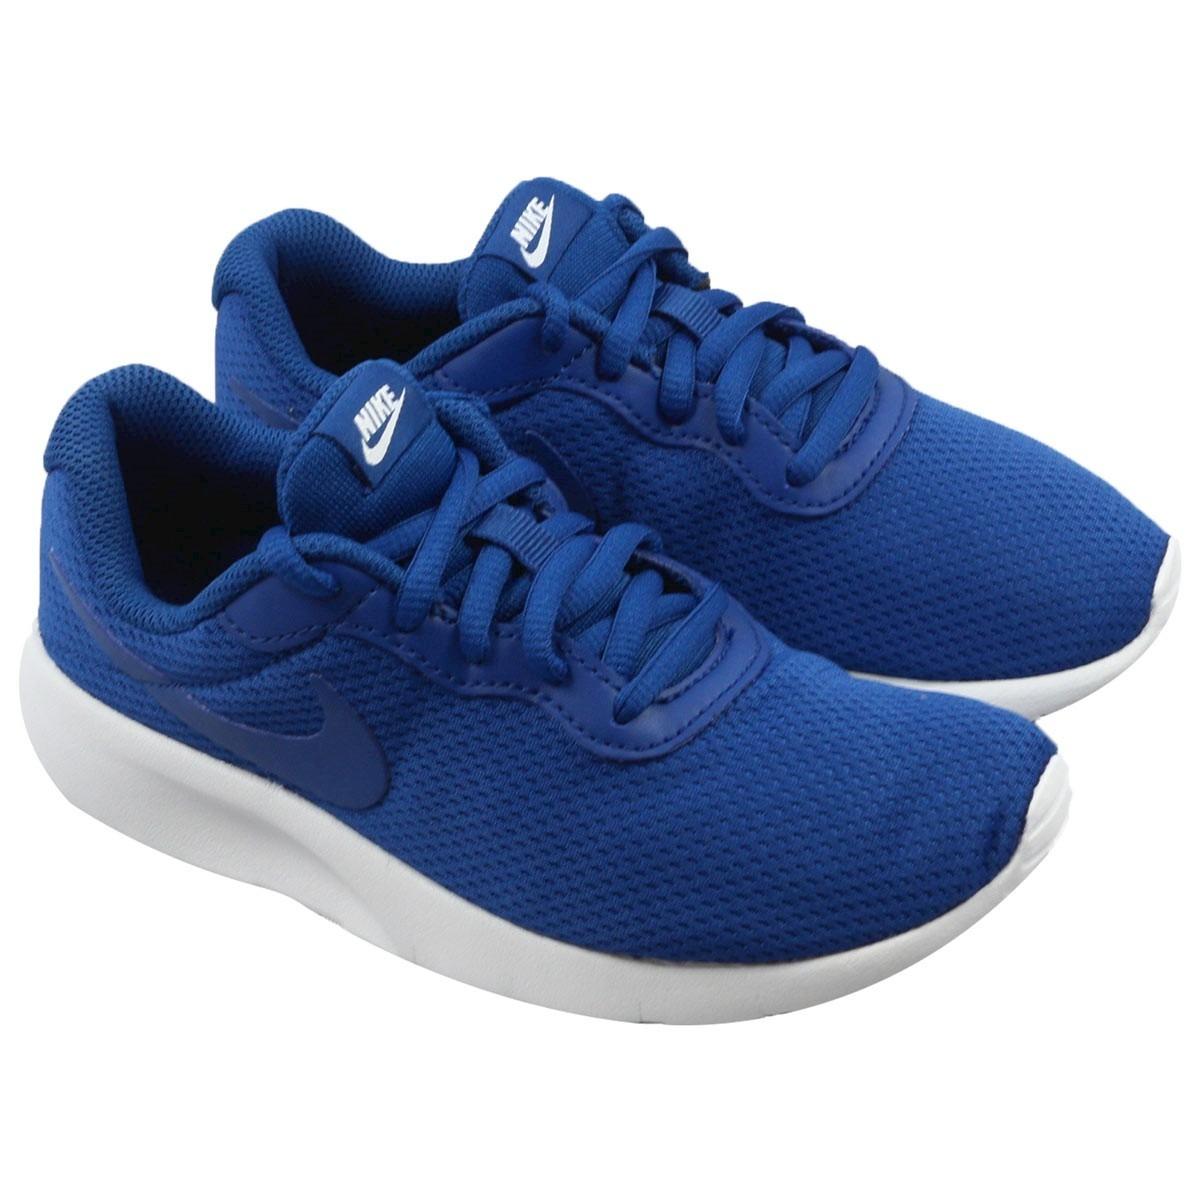 Chollazo Zapatillas infantiles Nike Tanjun GS por sólo 34,99